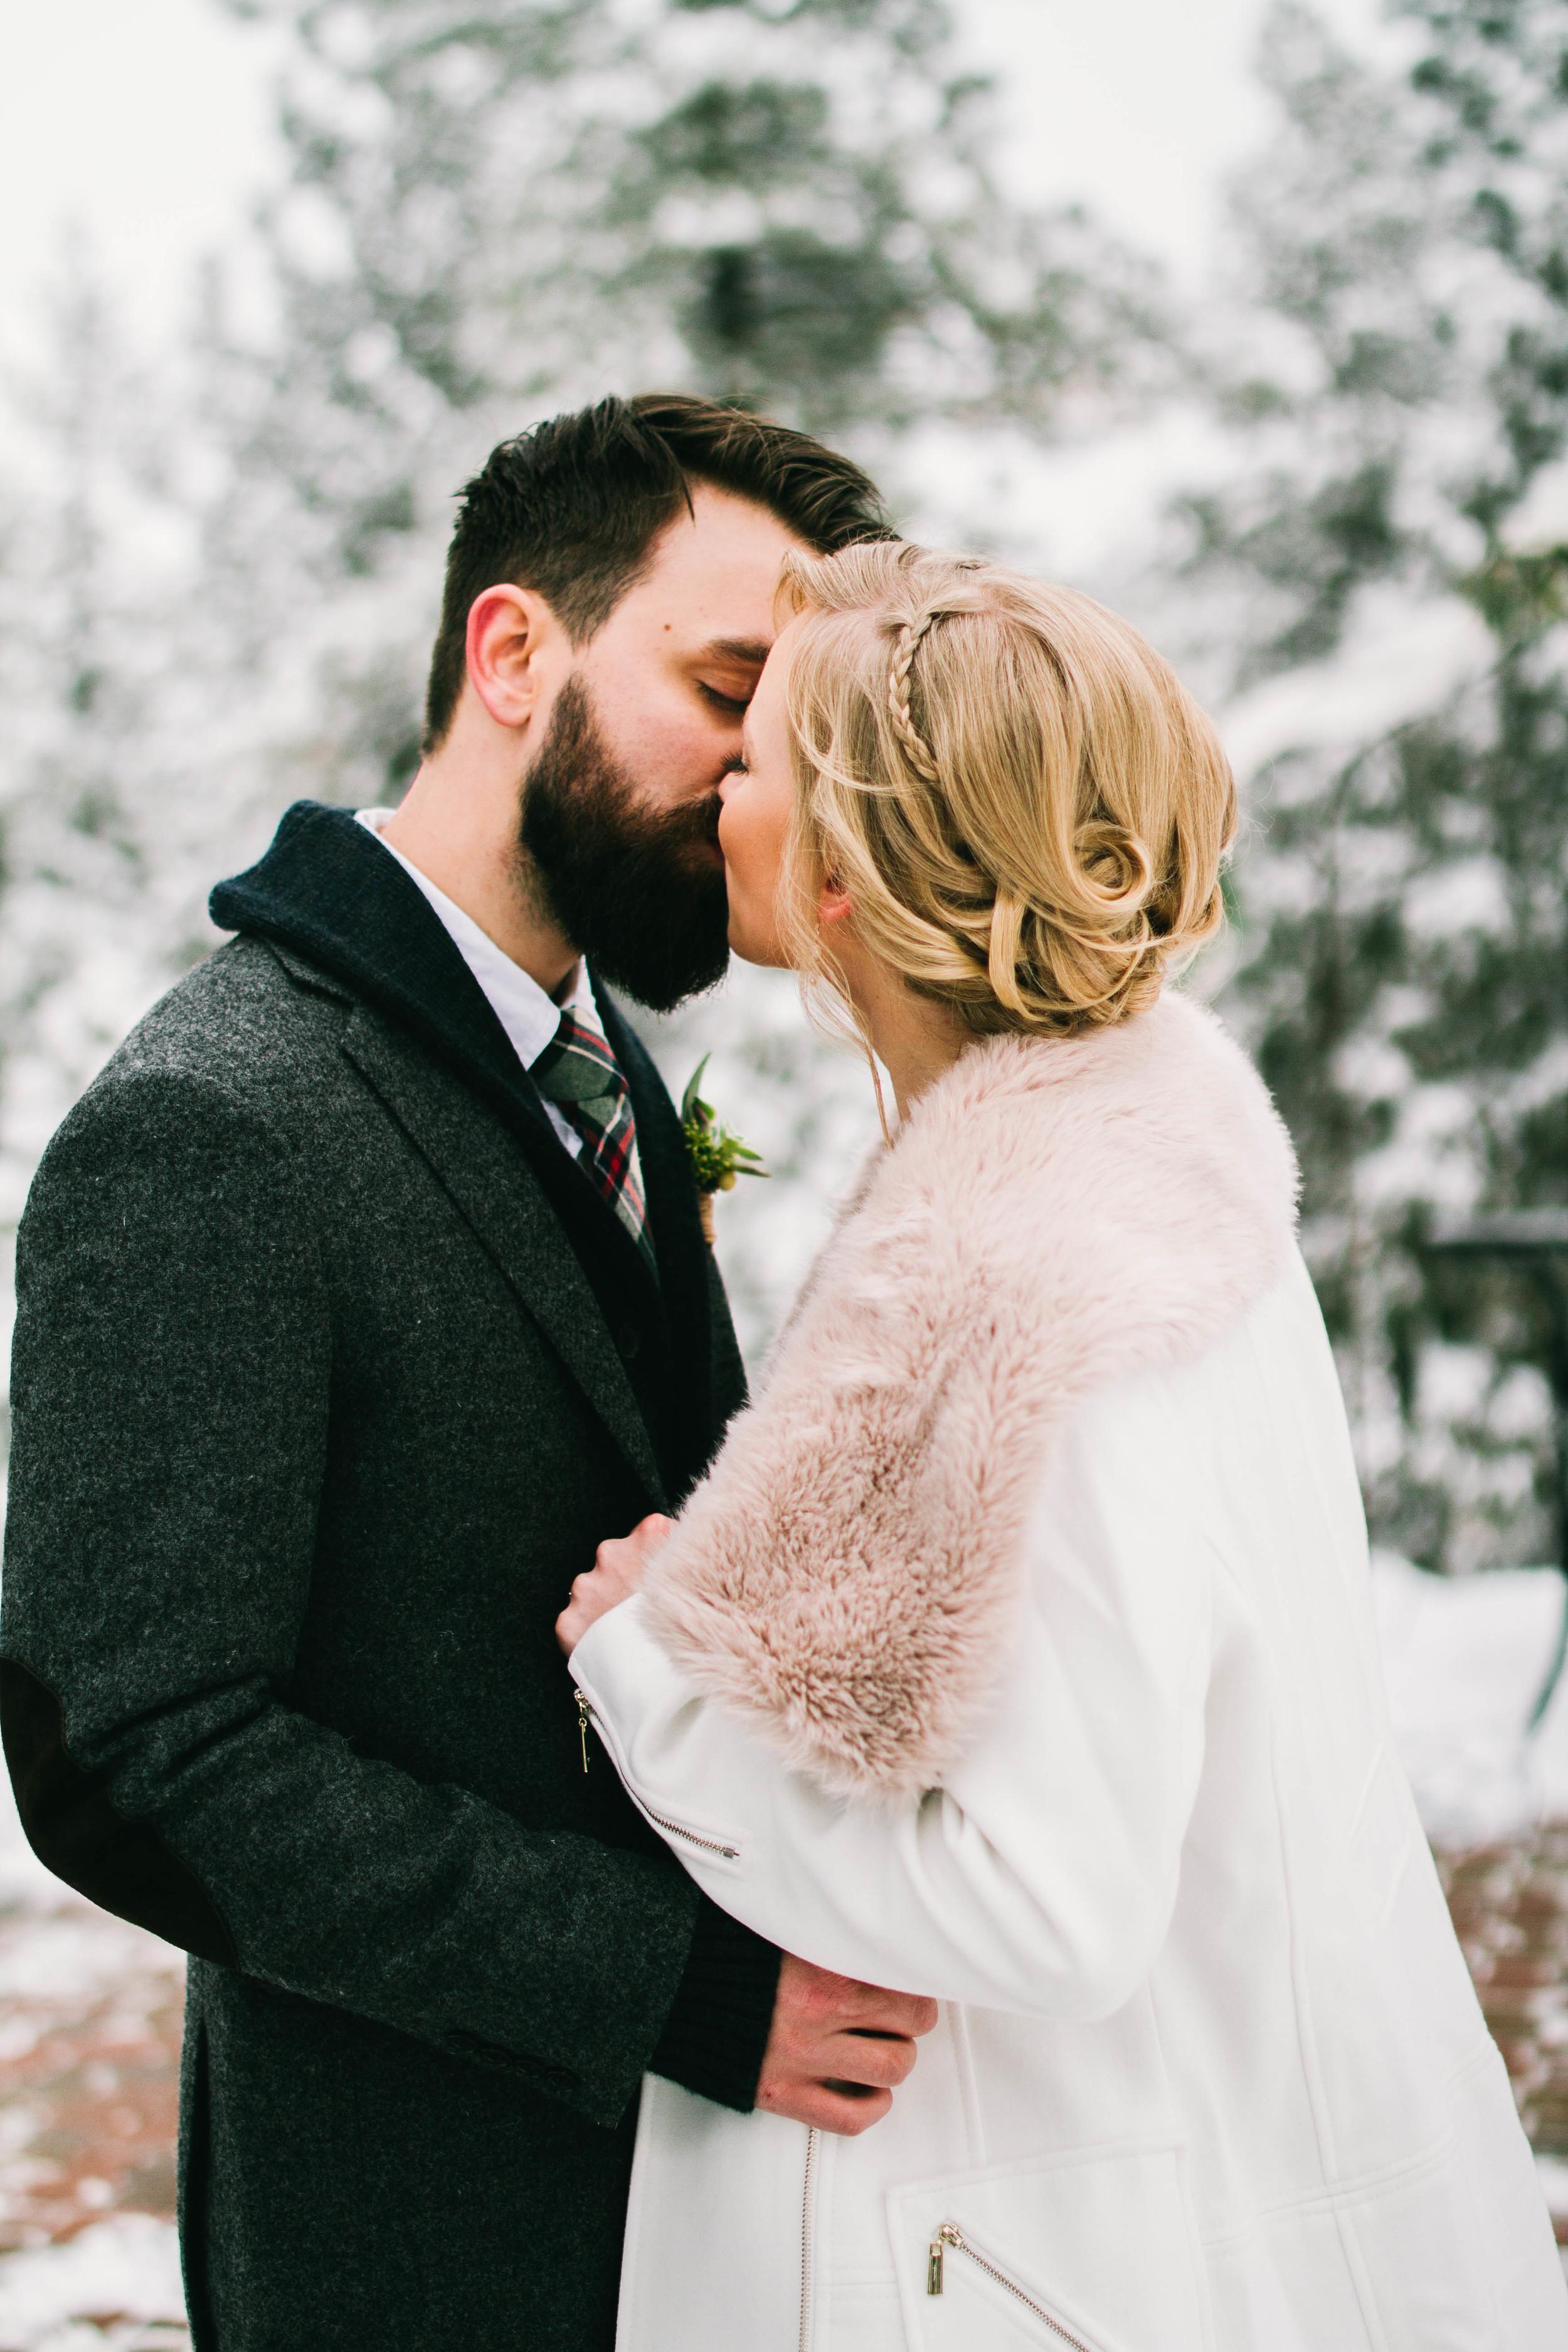 Bonin Wedding - Madeleine Bonin Photography-5855.jpg